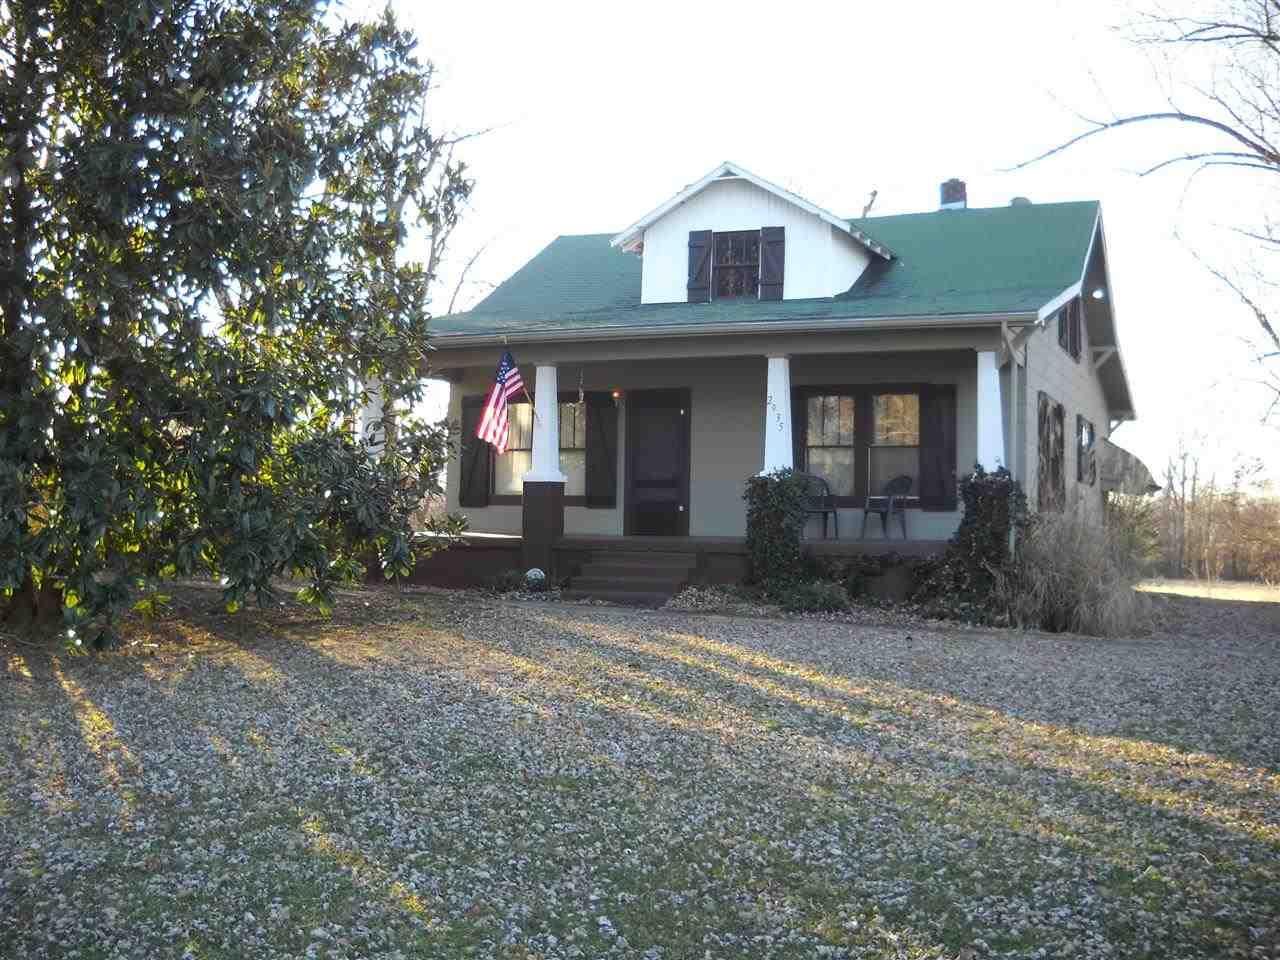 Real Estate for Sale, ListingId: 31618879, West Paducah,KY42086